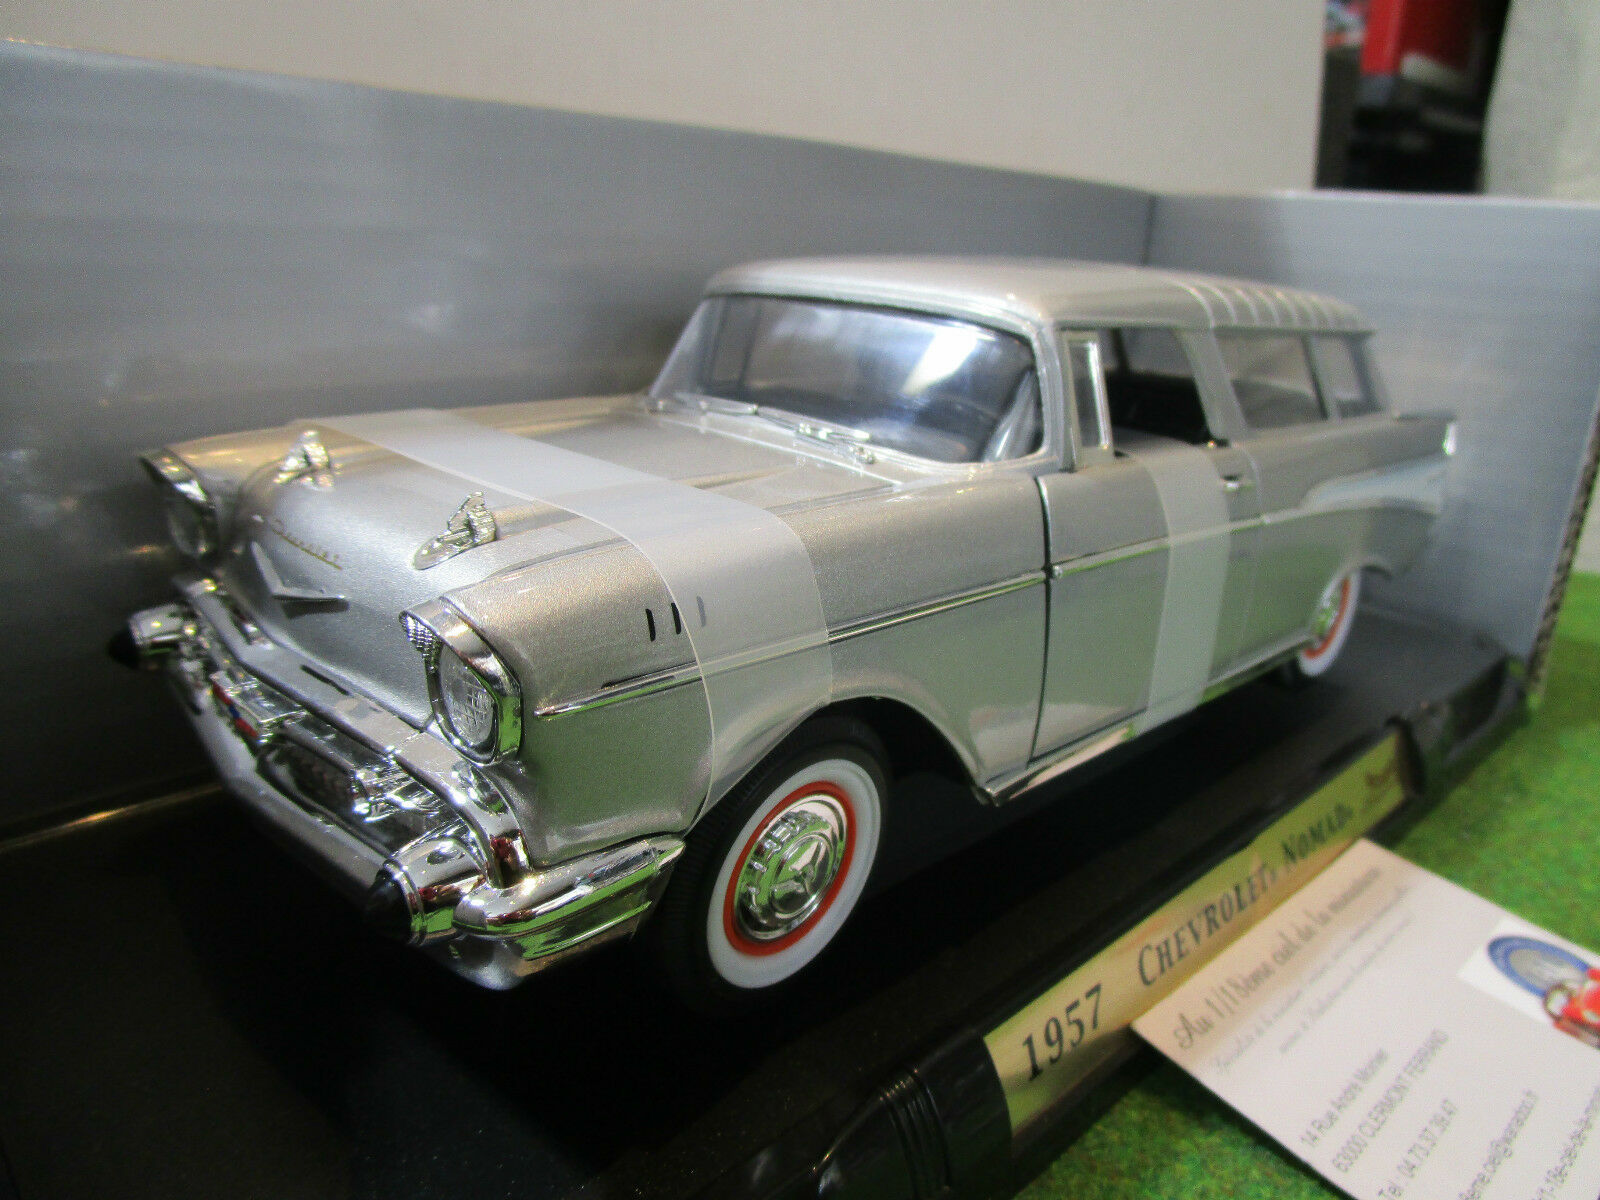 precio razonable CHEVROLET NOMAD de 1957 gris gris gris au 1 18 YATMING 92088 voiture miniature  apresurado a ver